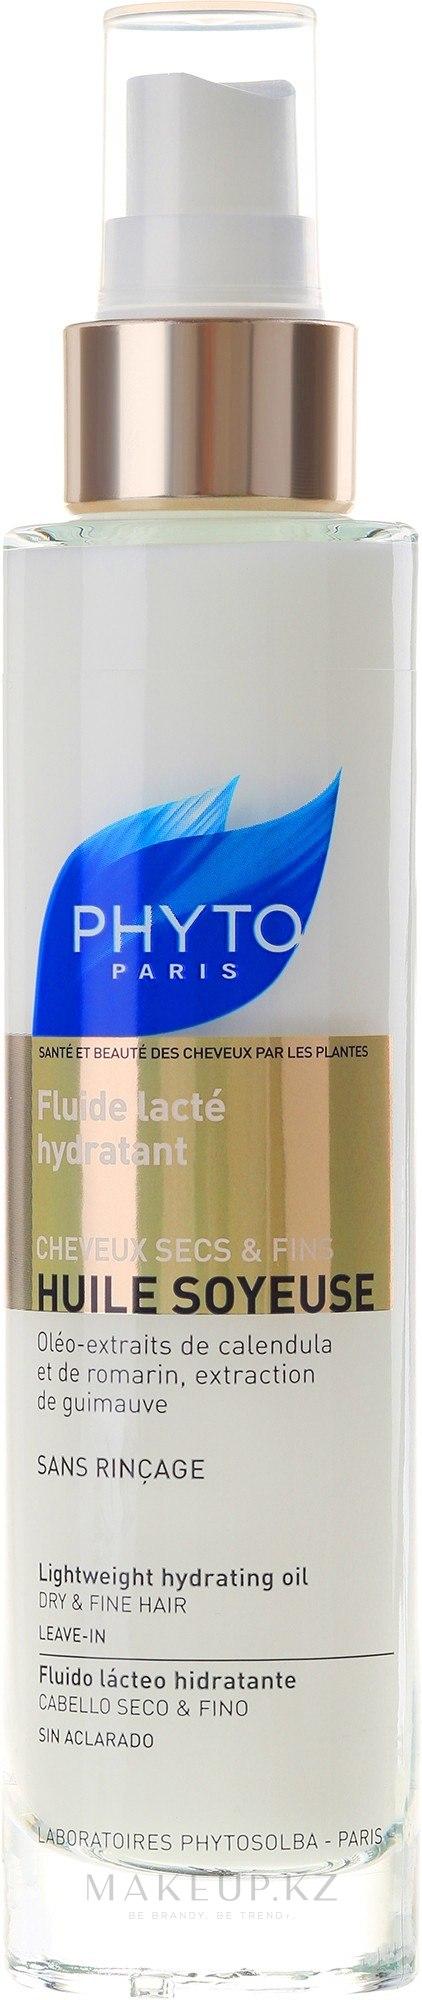 Увлажняющее масло для волос - Phyto Huile Soyeuse Lightweight Hydrating Oil — фото 100 ml